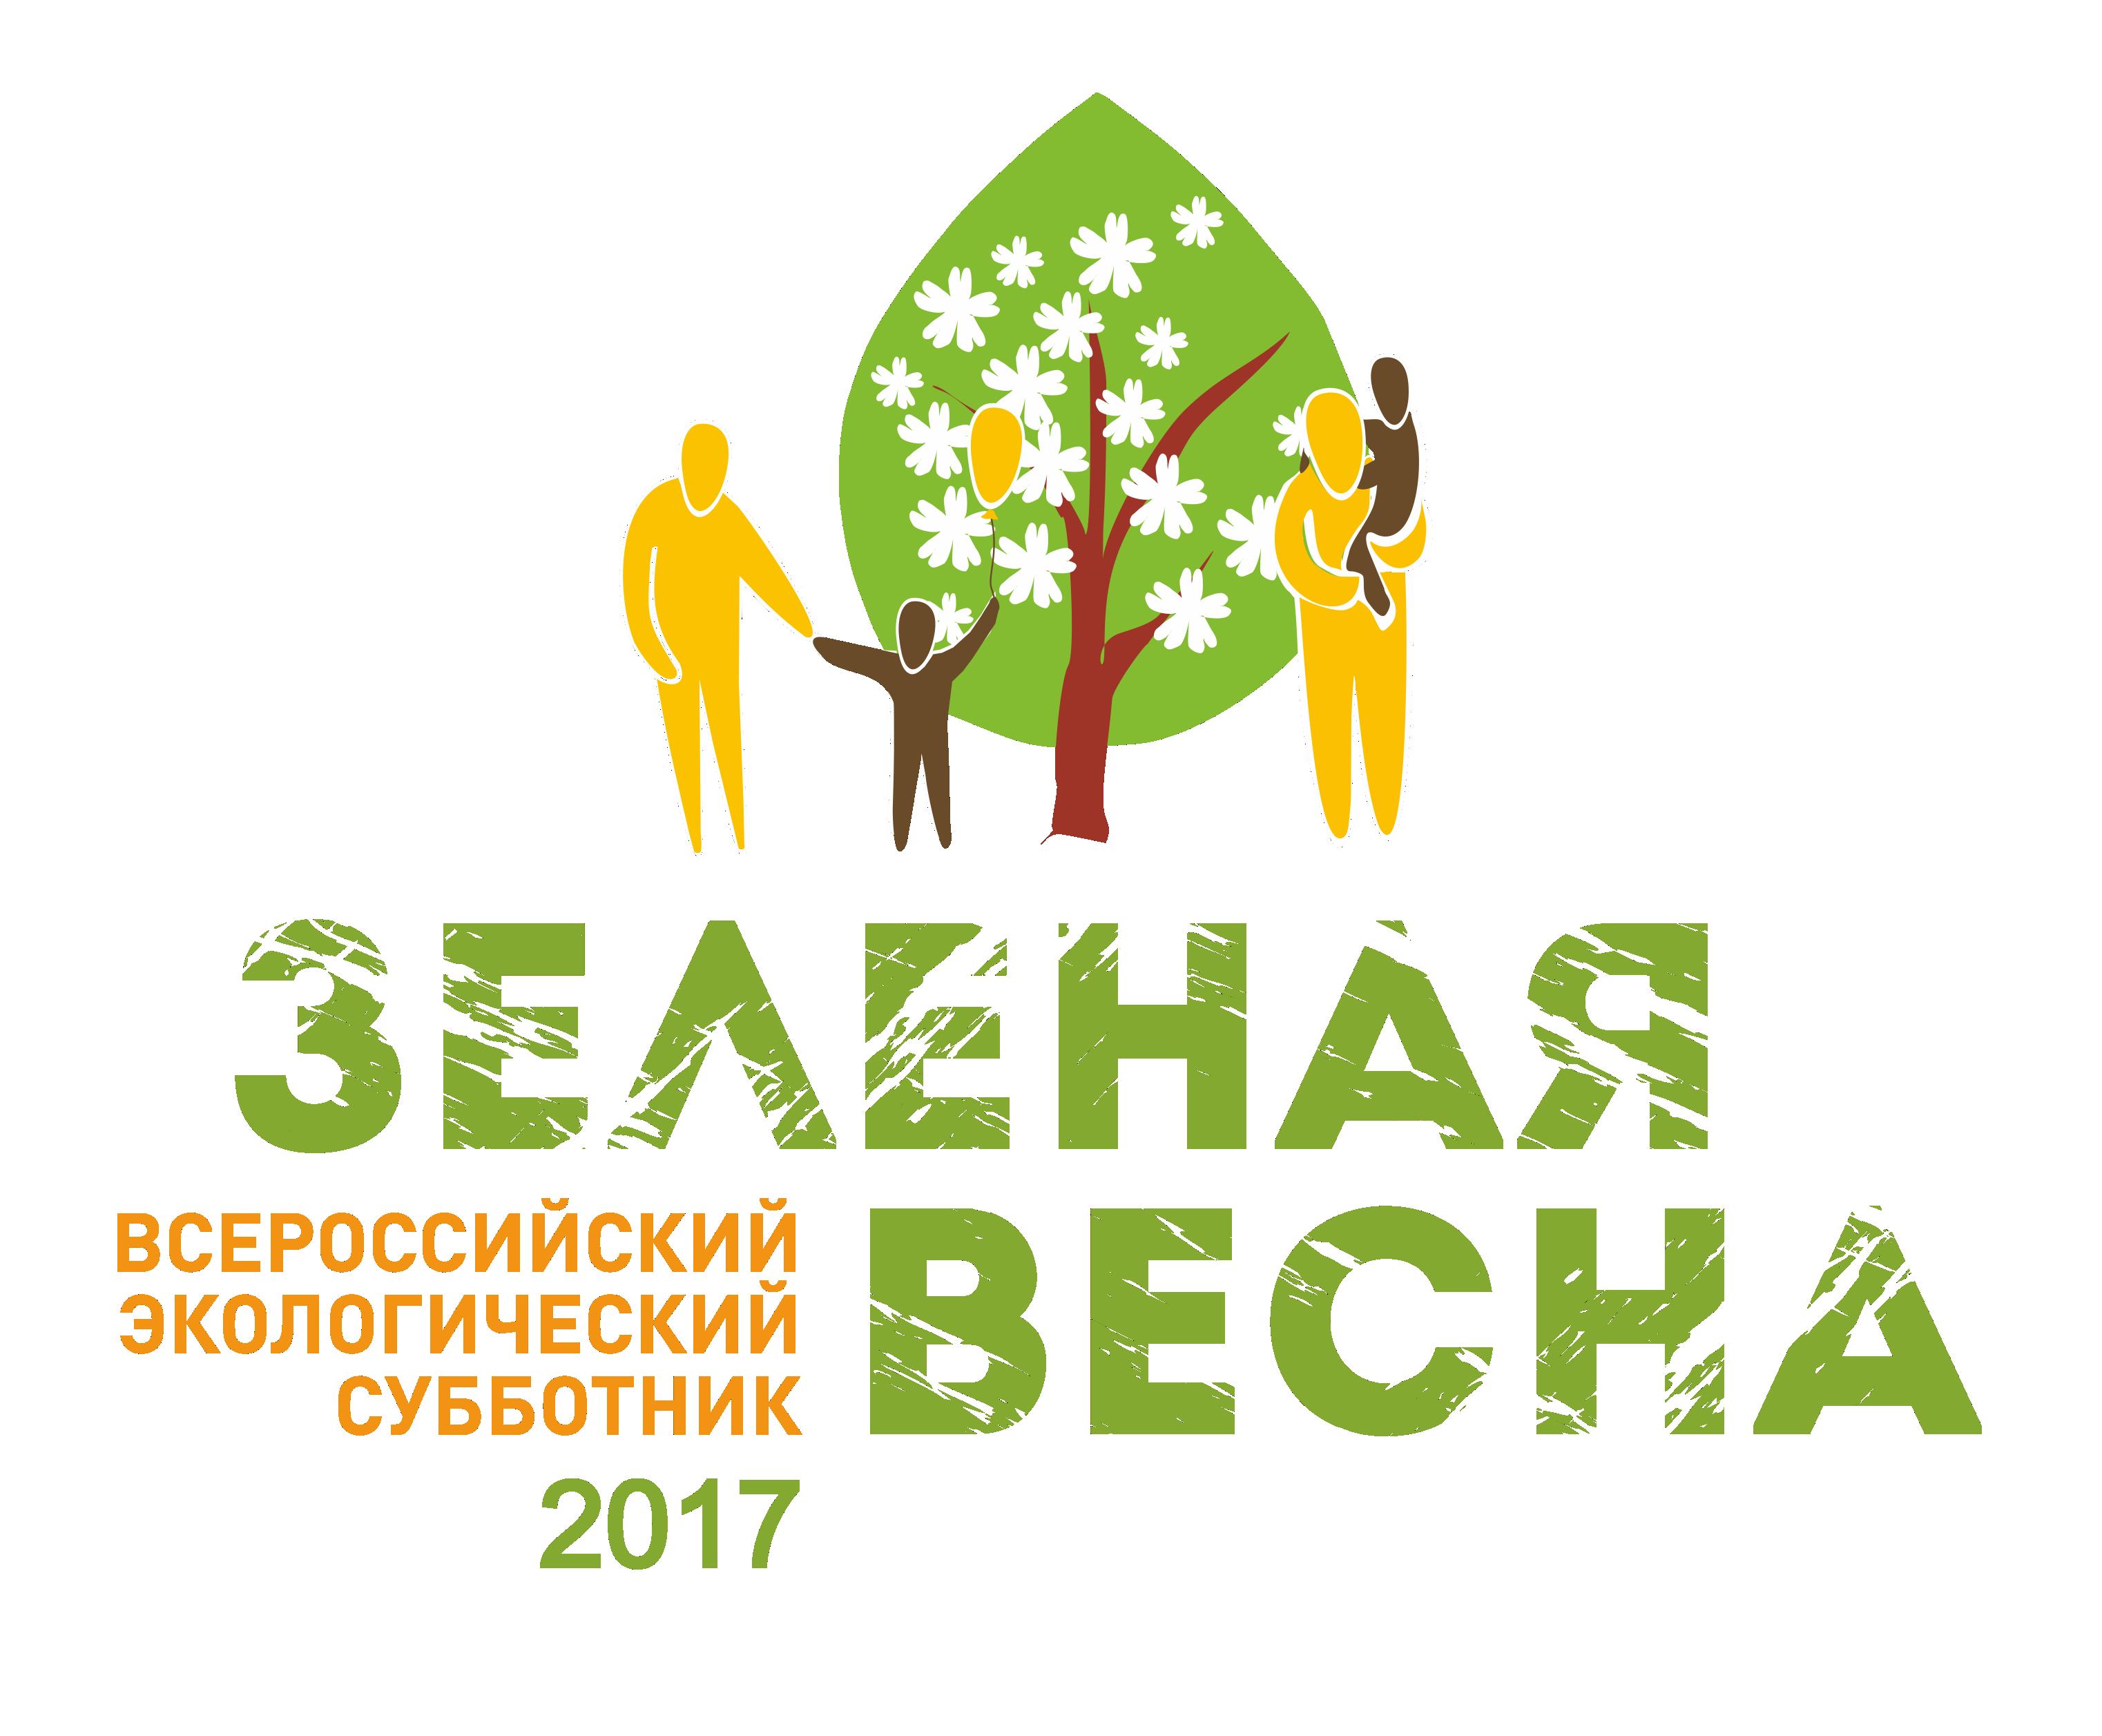 Zelenaya_Vesna_2017